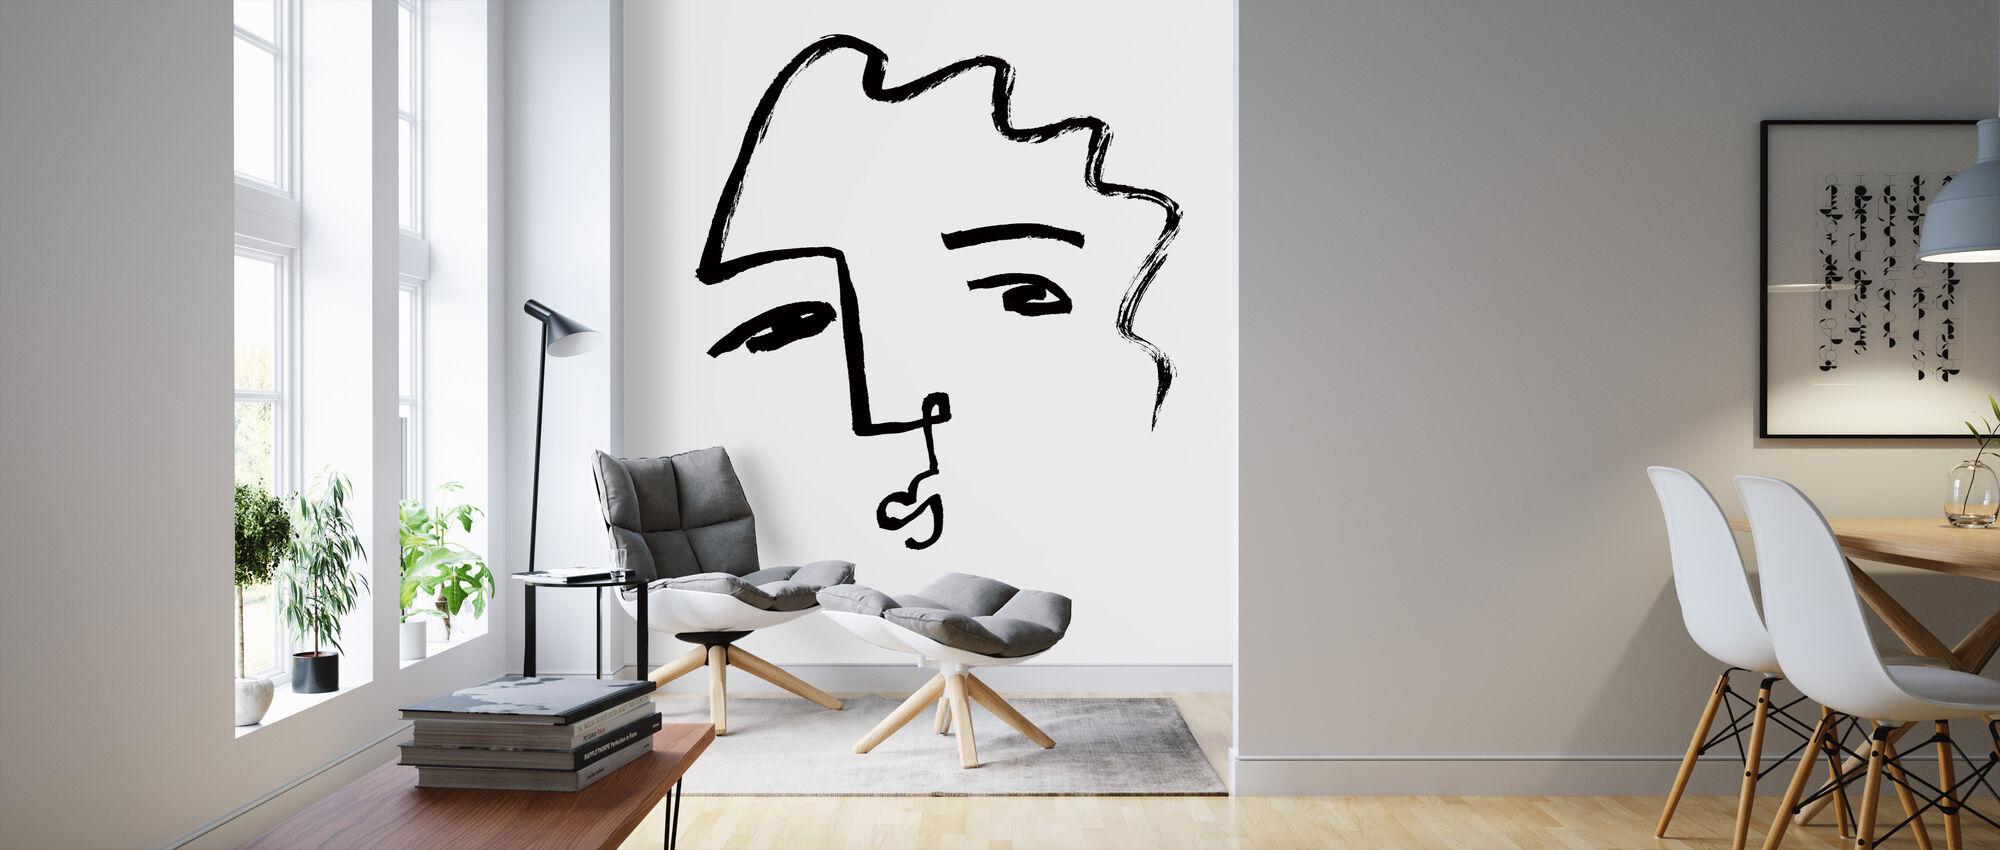 Making Faces II - Wallpaper - Living Room